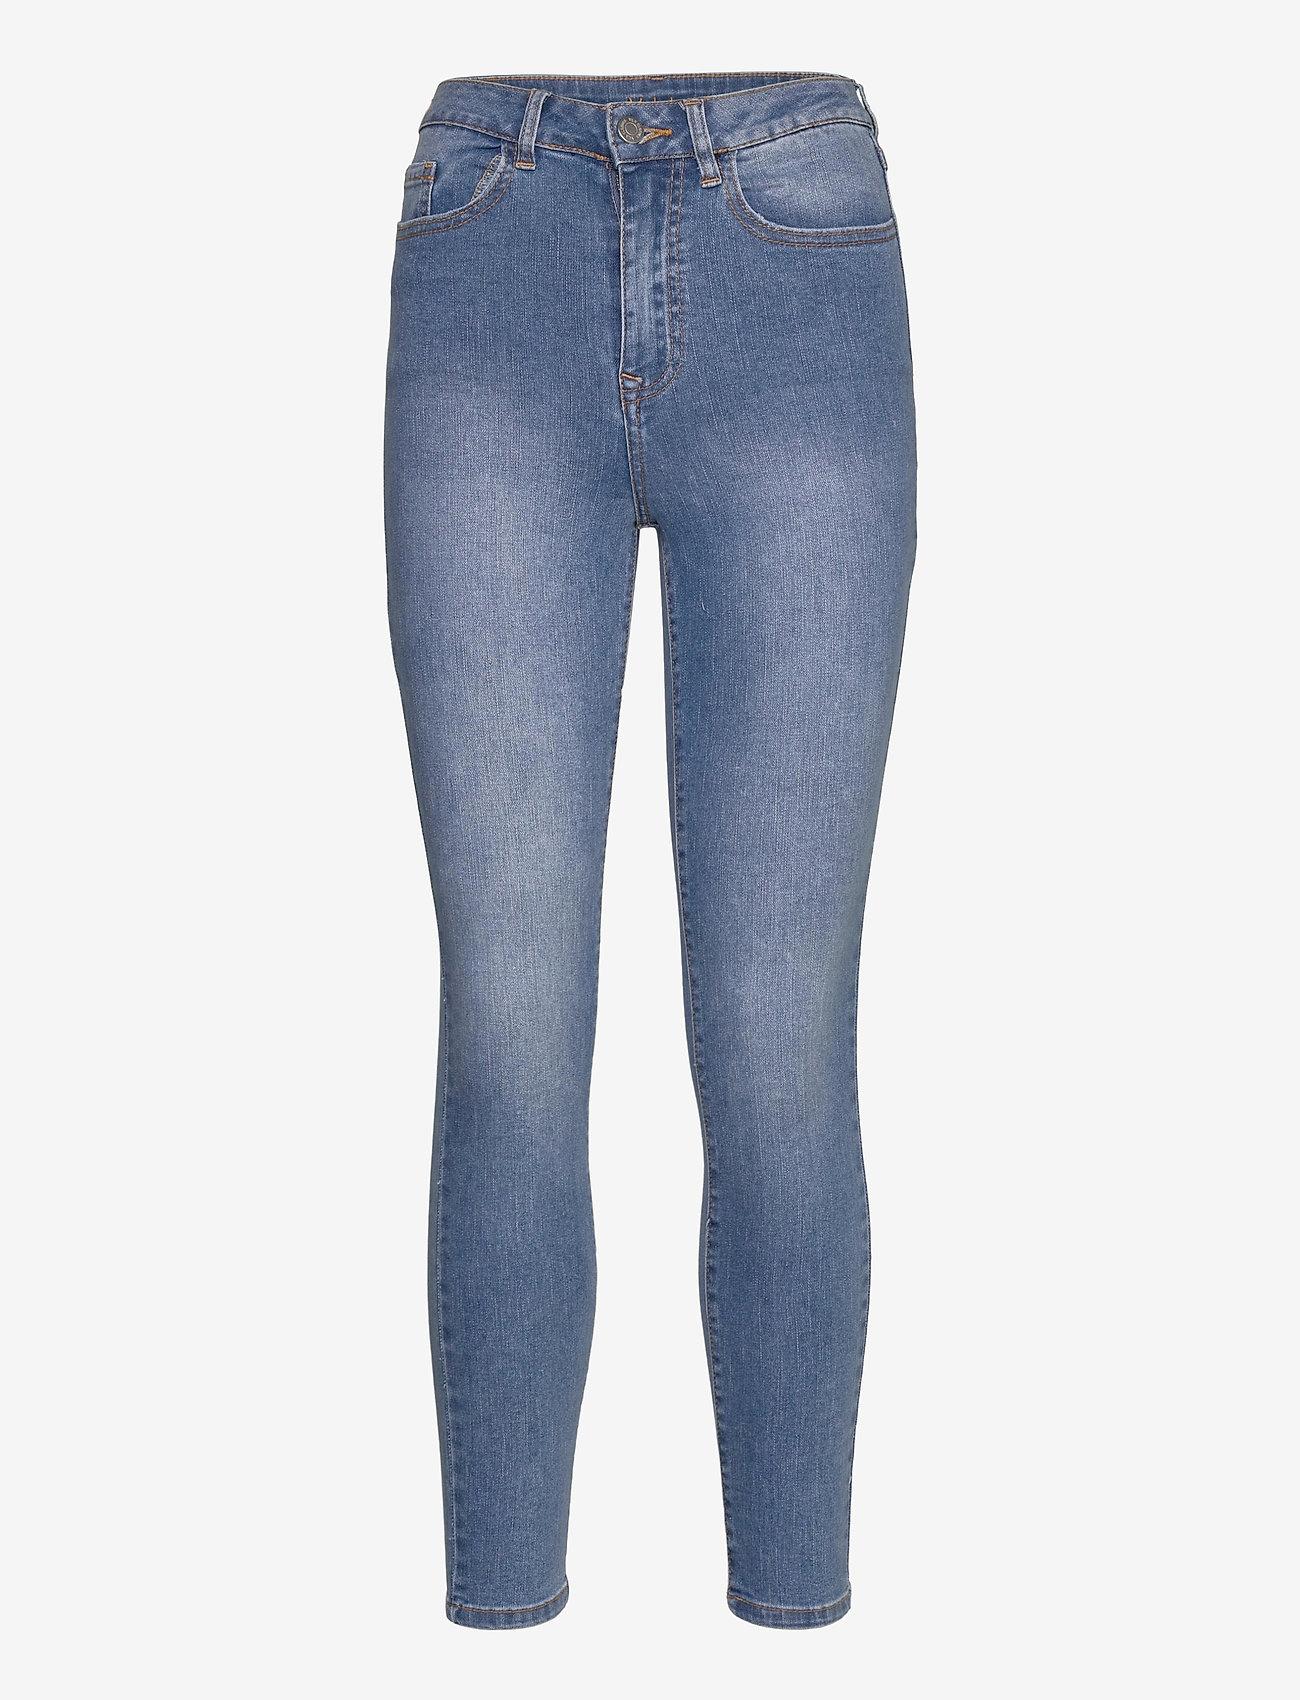 Vila - VIEKKO HWSK 7/8 JEANS/SU - - skinny jeans - medium blue denim - 0